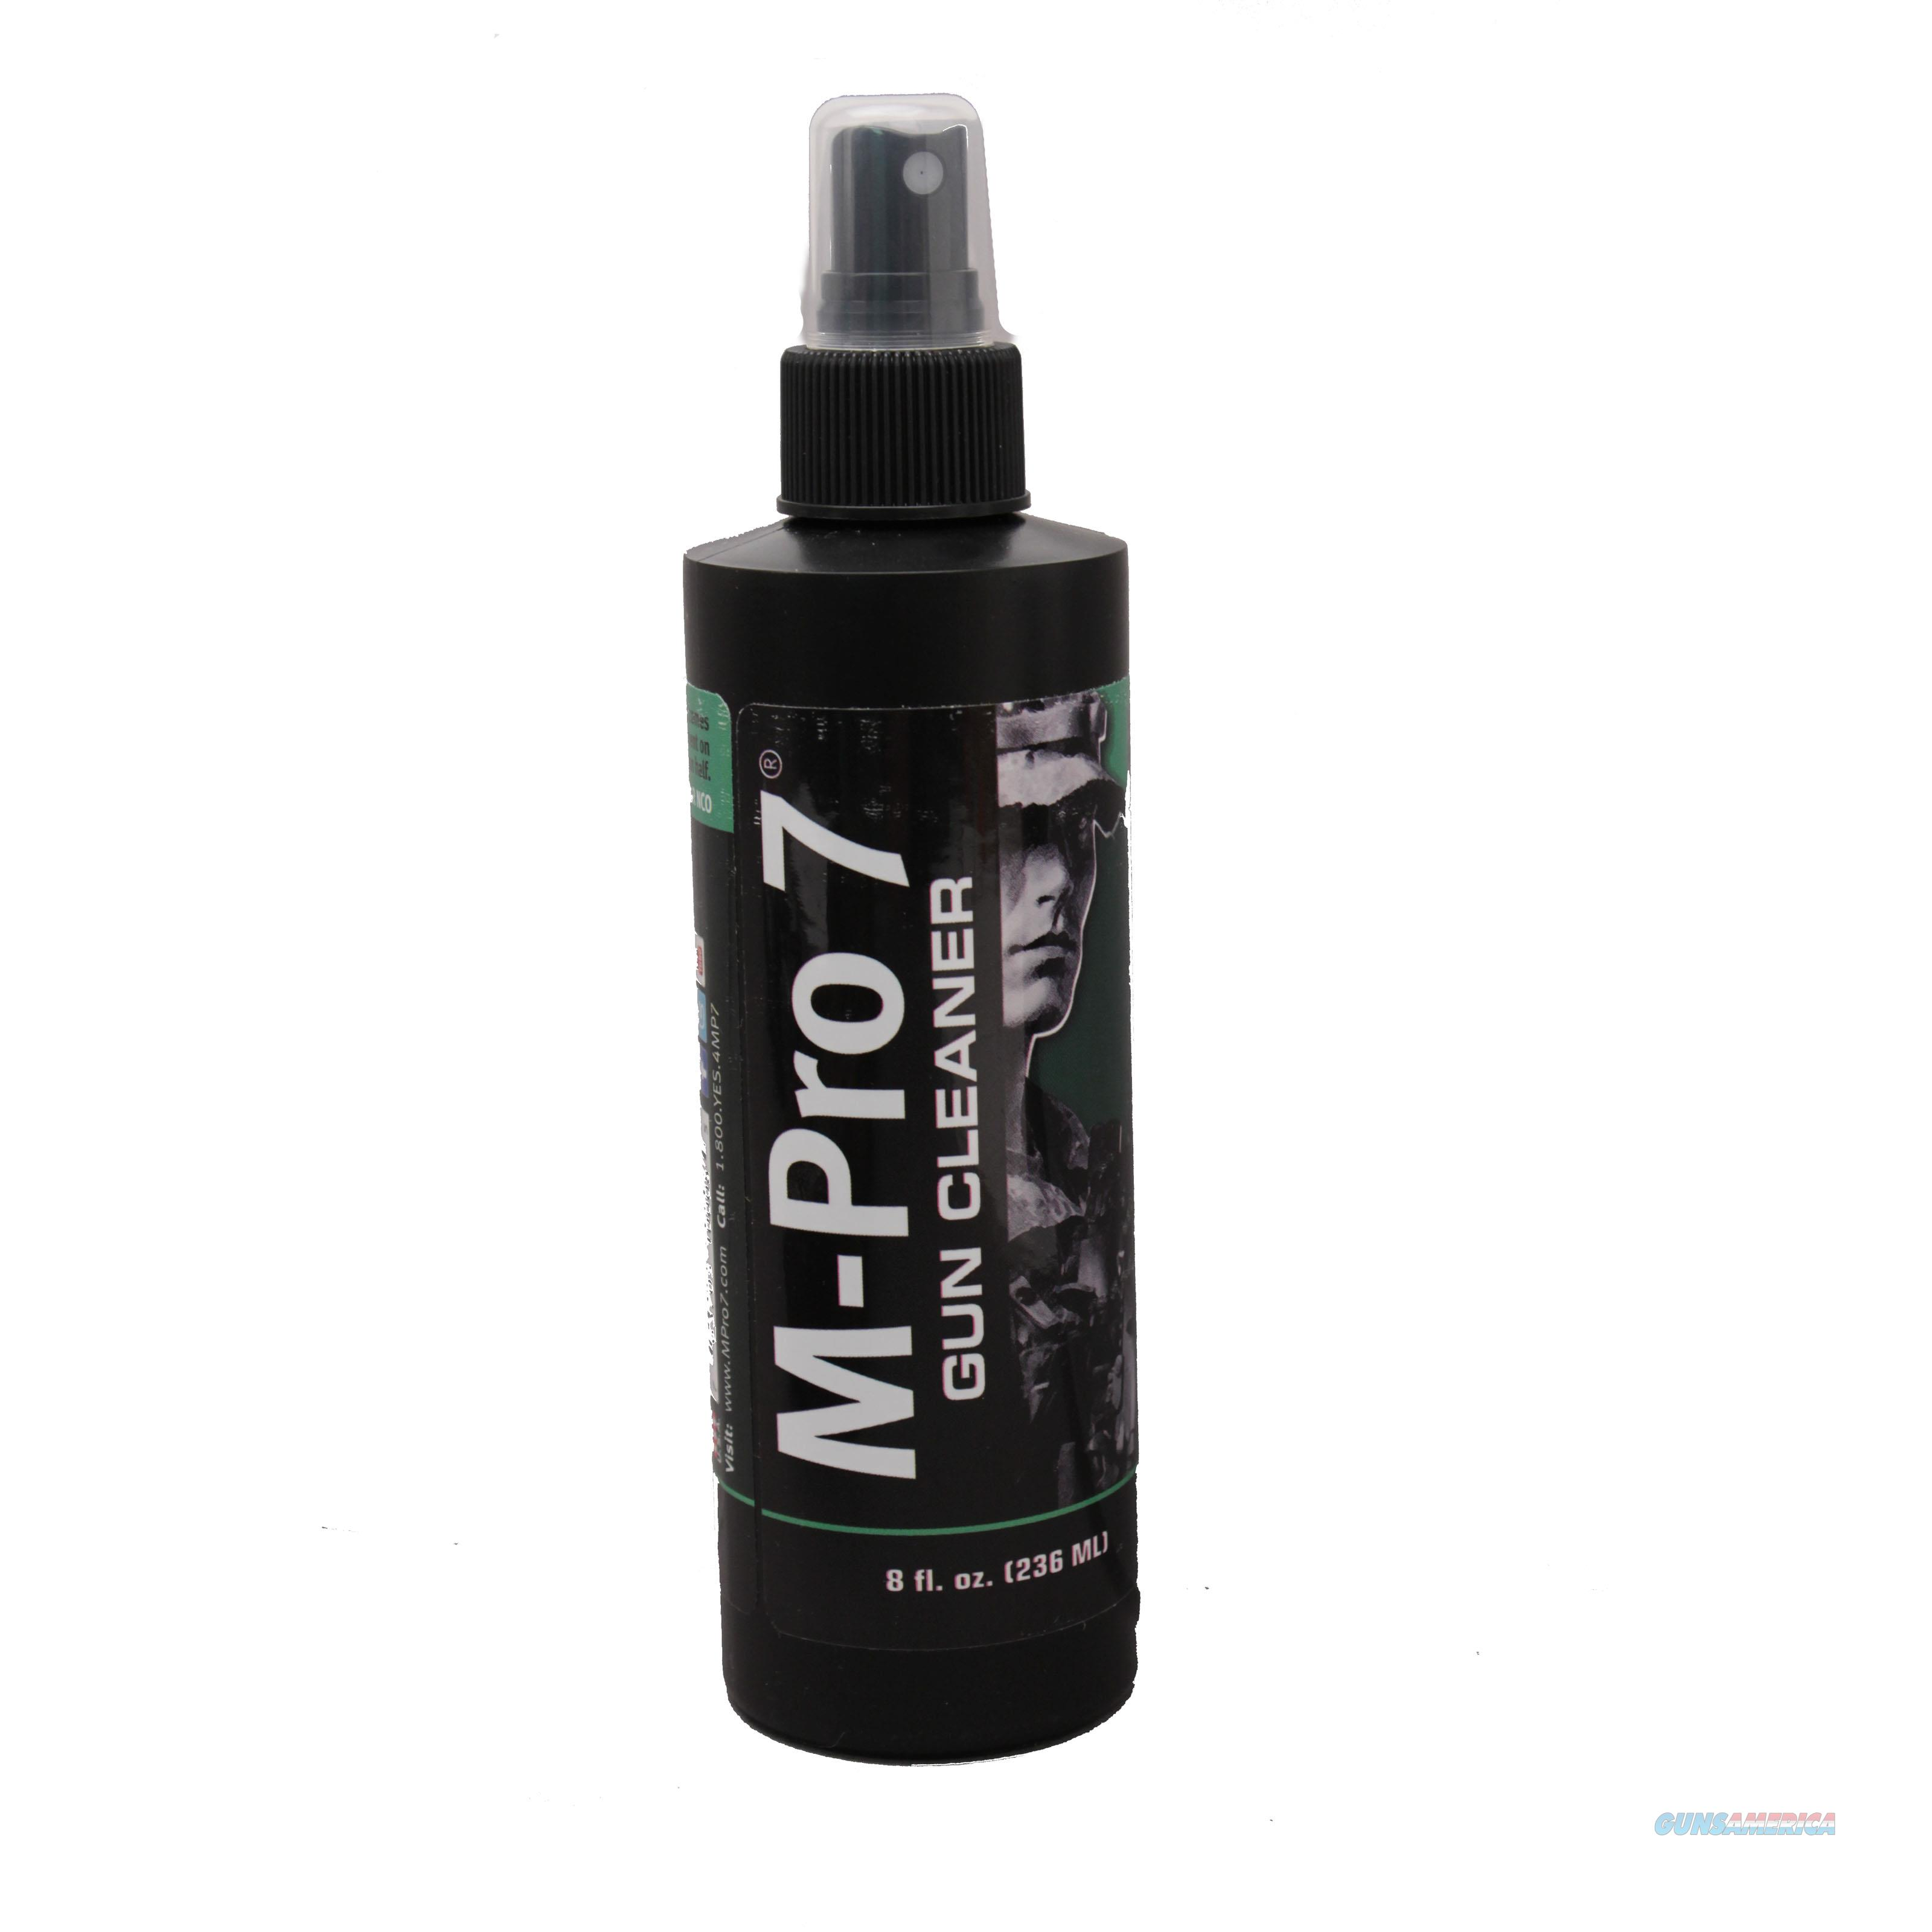 Hoppe's M-Pro 7 Gun Cleaner Spray 070-1005  Non-Guns > Gunsmith Tools/Supplies